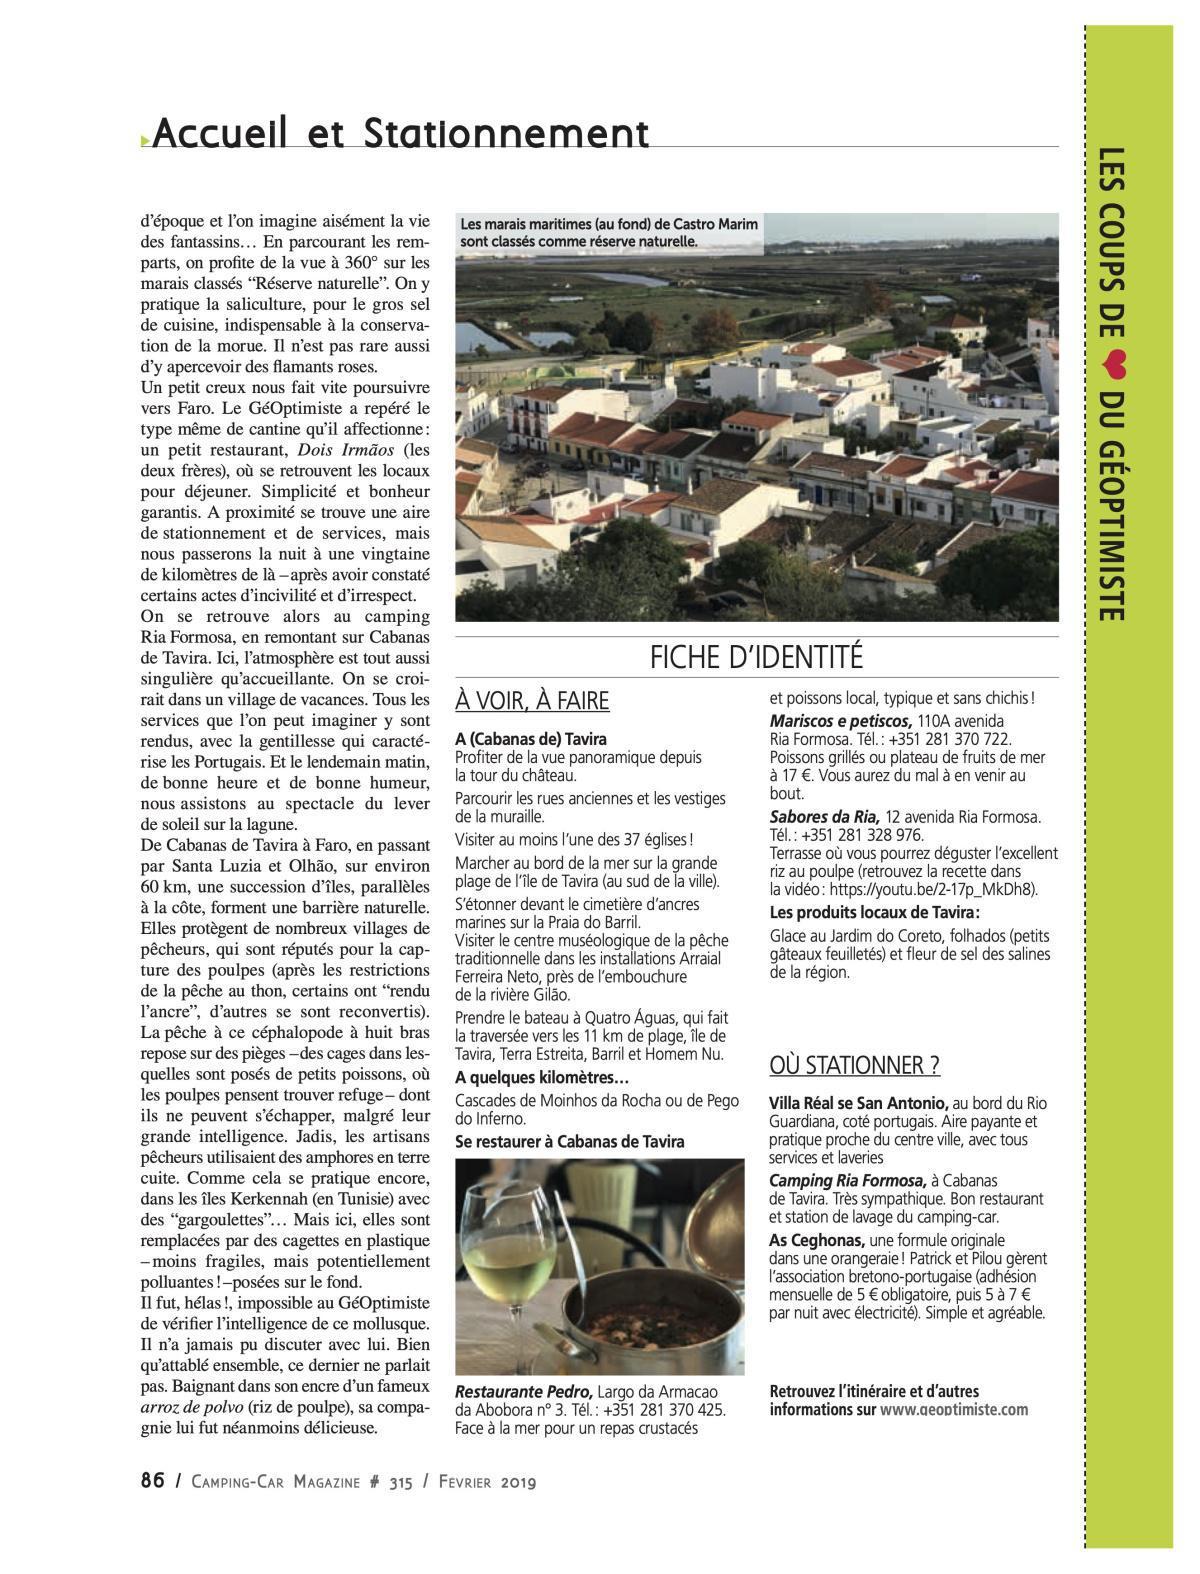 Tavira - Portugal - CCM 315